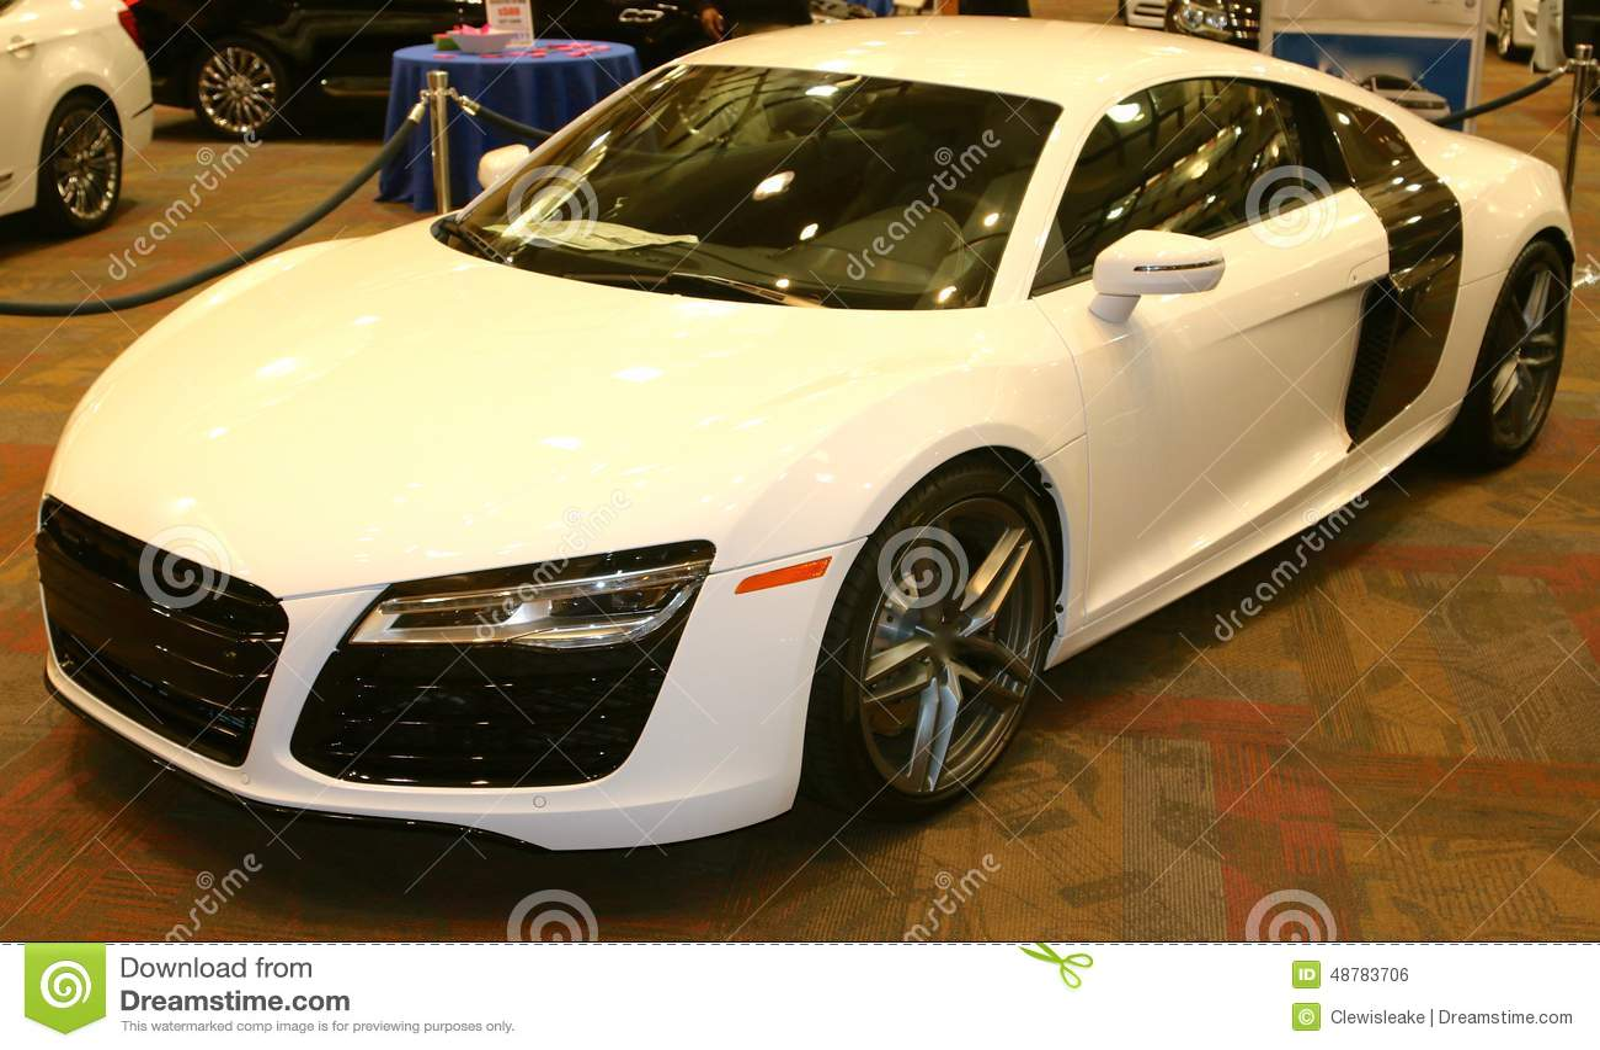 Memphis Design Car >> 2015 Audi R8 Exotic Sports Car Editorial Photo - Image: 48783706